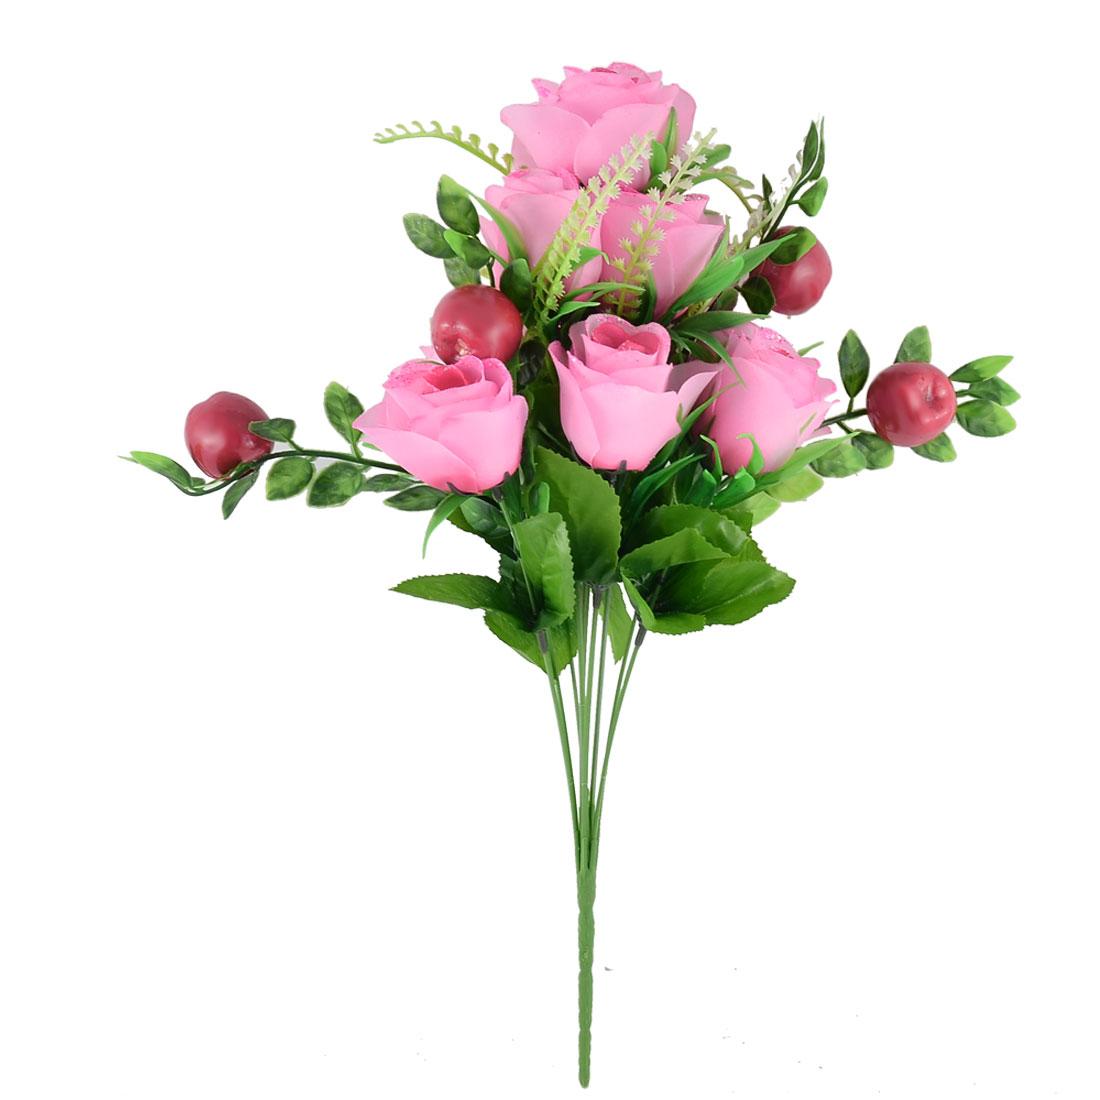 Artificial Emulational Rose Fruit Bouquet Wedding Party Home Decoration Pink